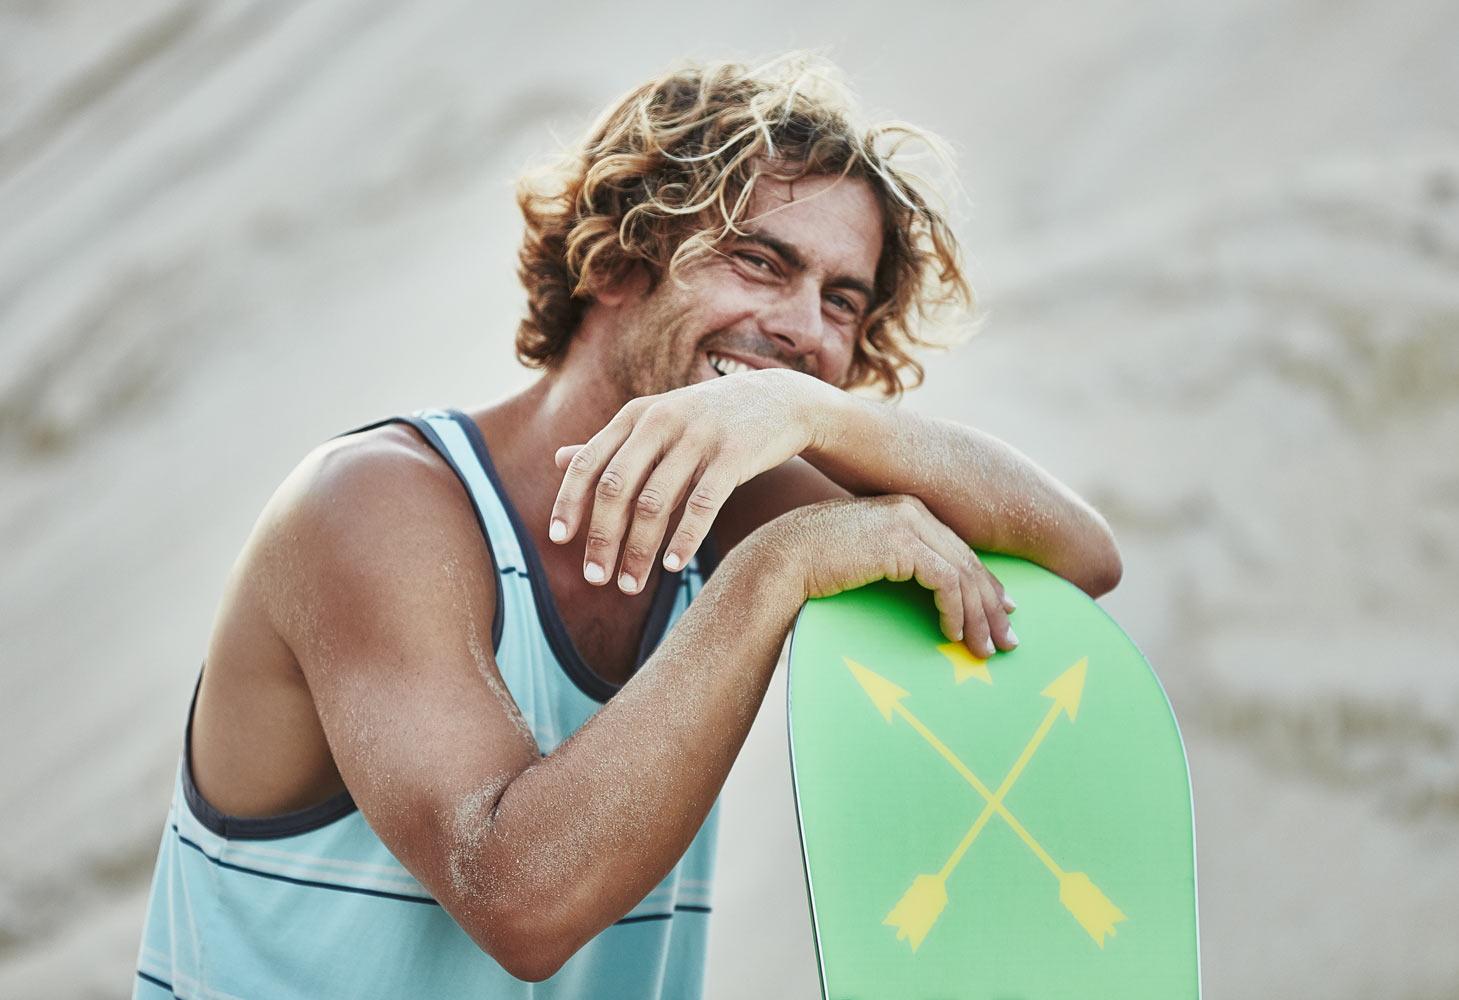 pavel-hejny-sandboarder-lifestyle-2